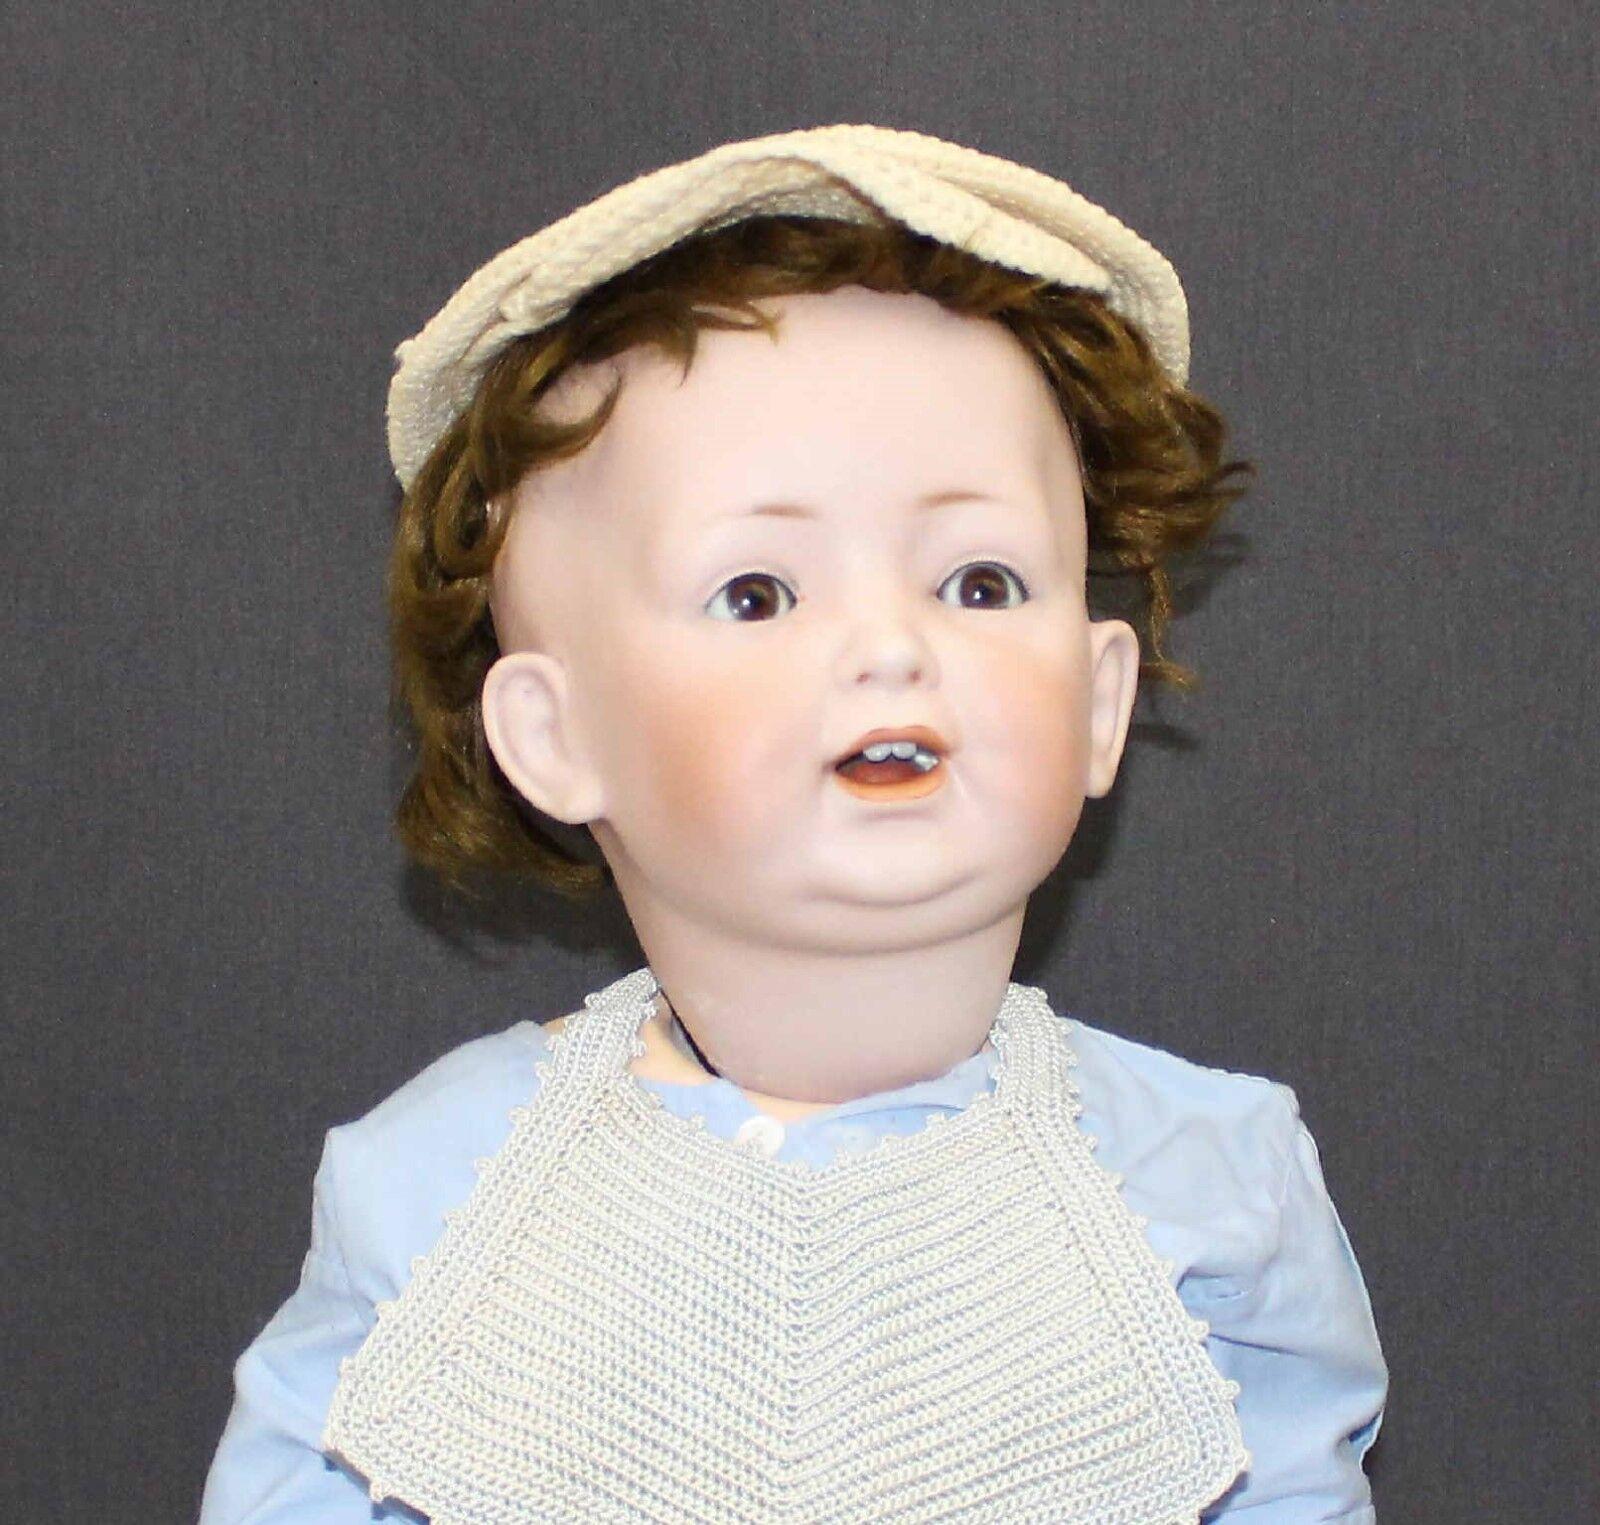 Muñeca Bebé Biscuit Alemán Antiguo por Kestner-Mold